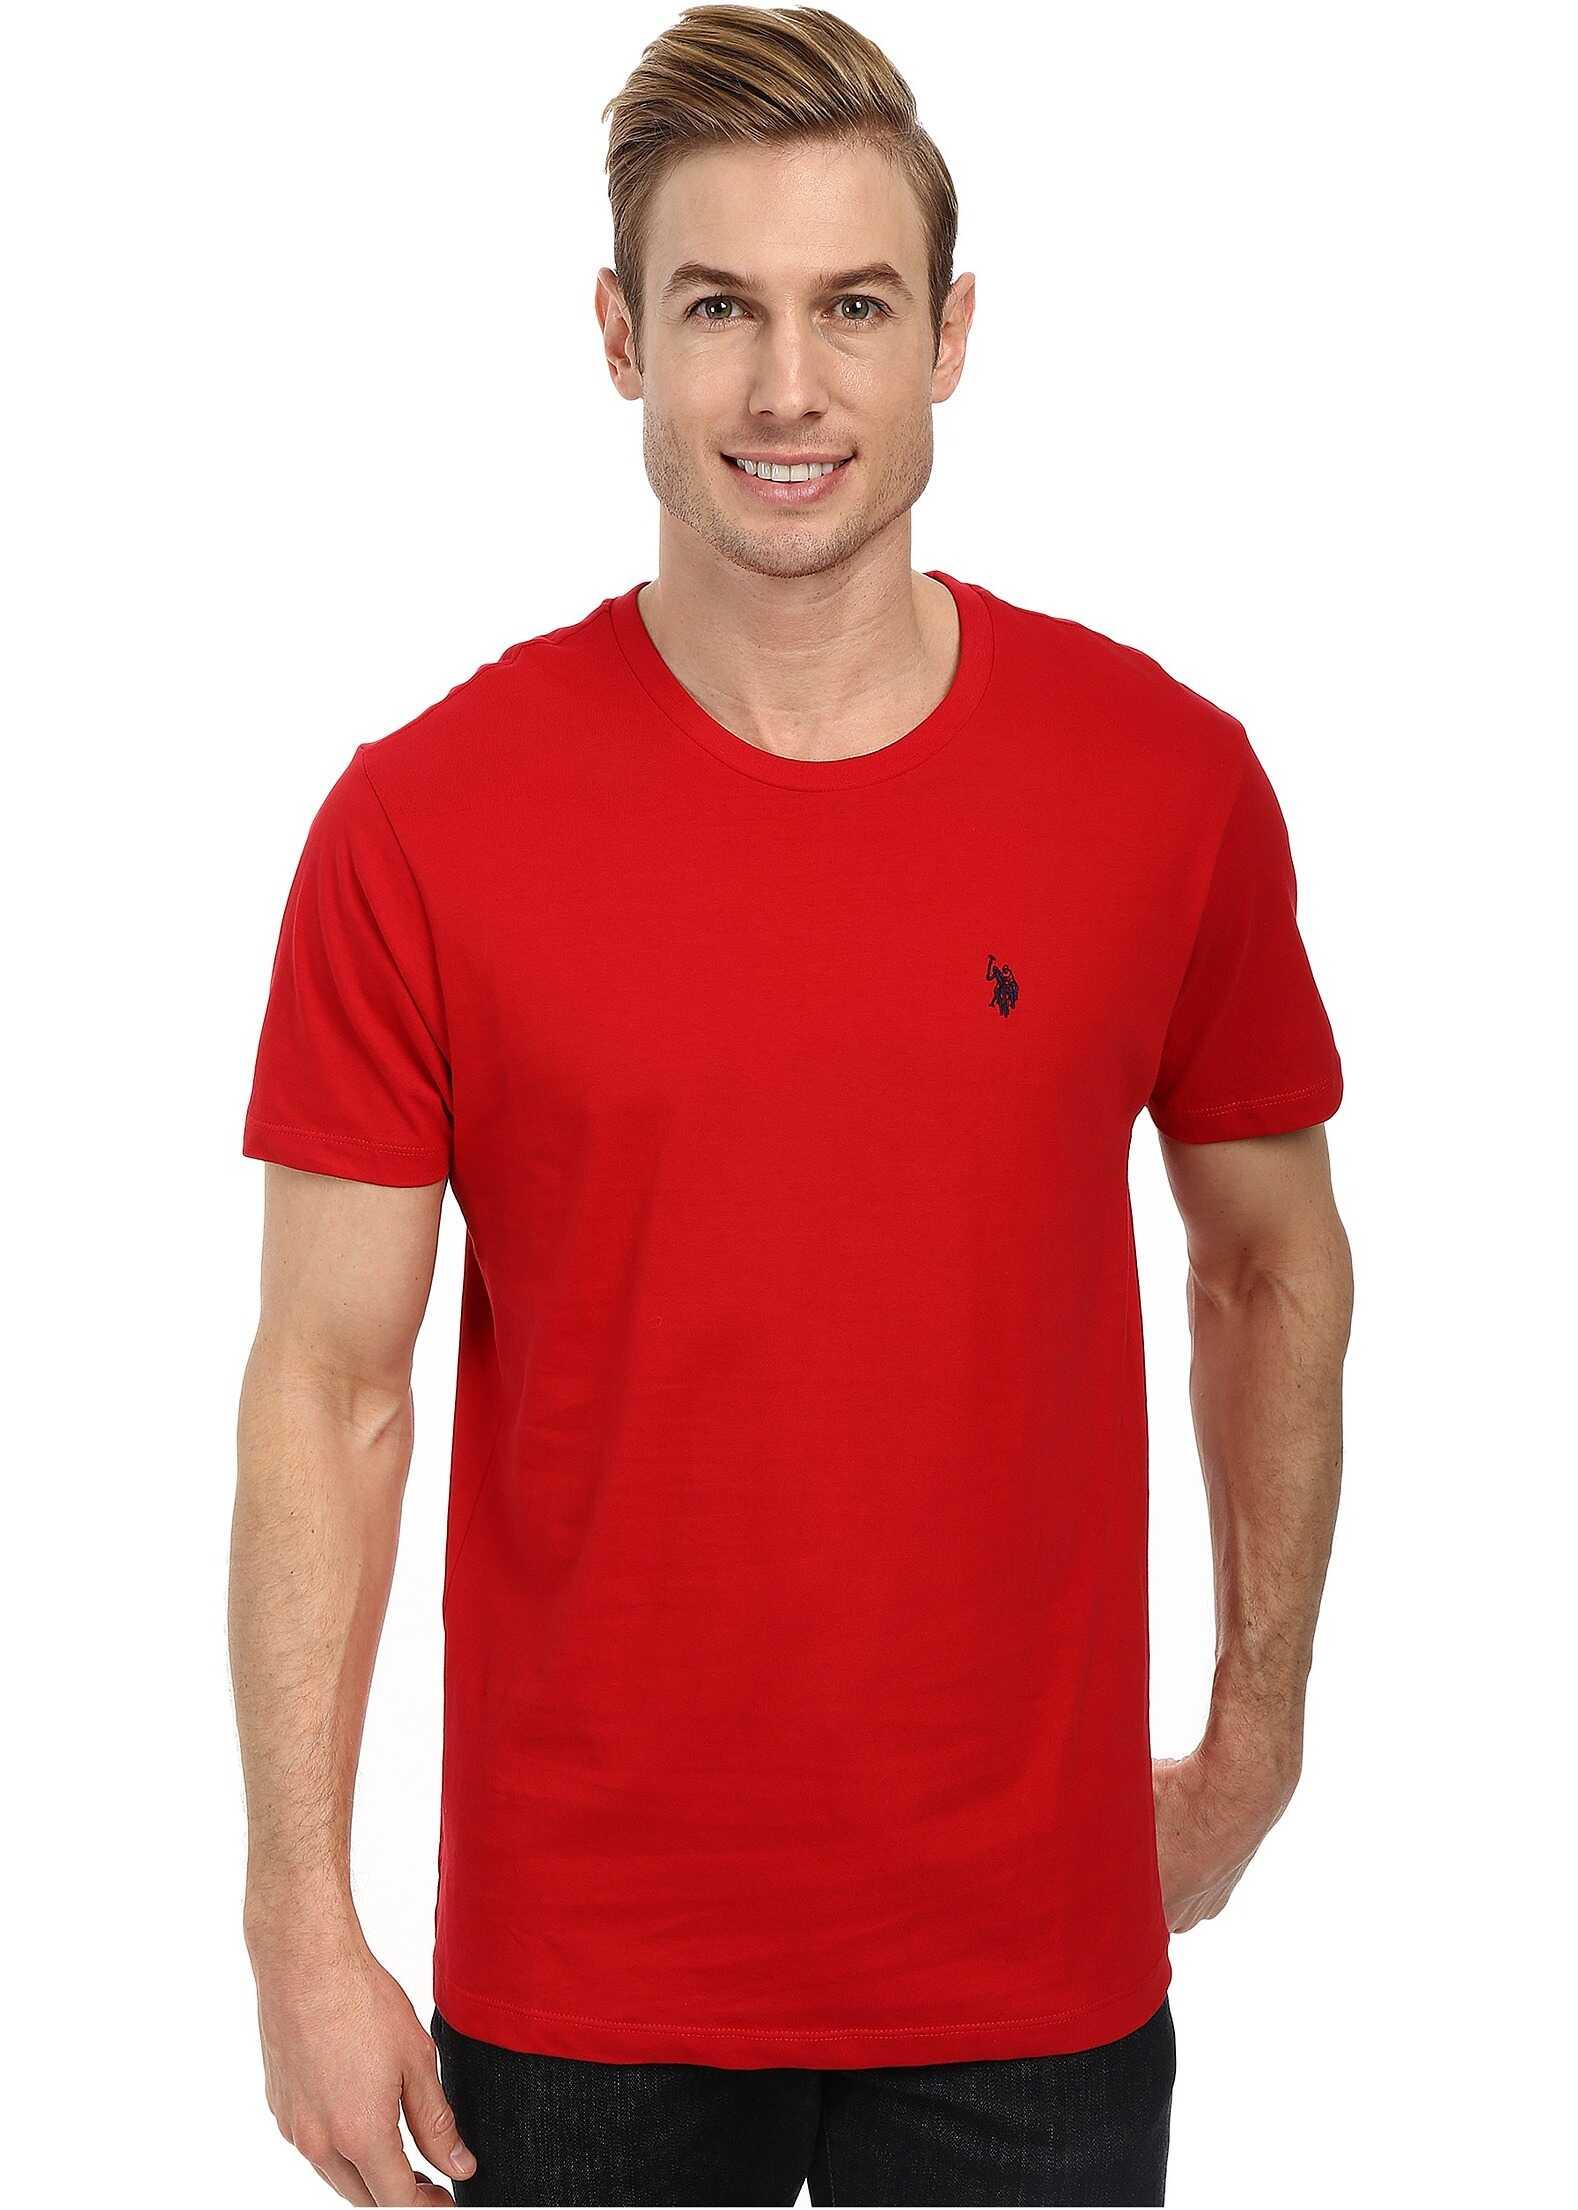 Crew Neck Small Pony T-Shirt